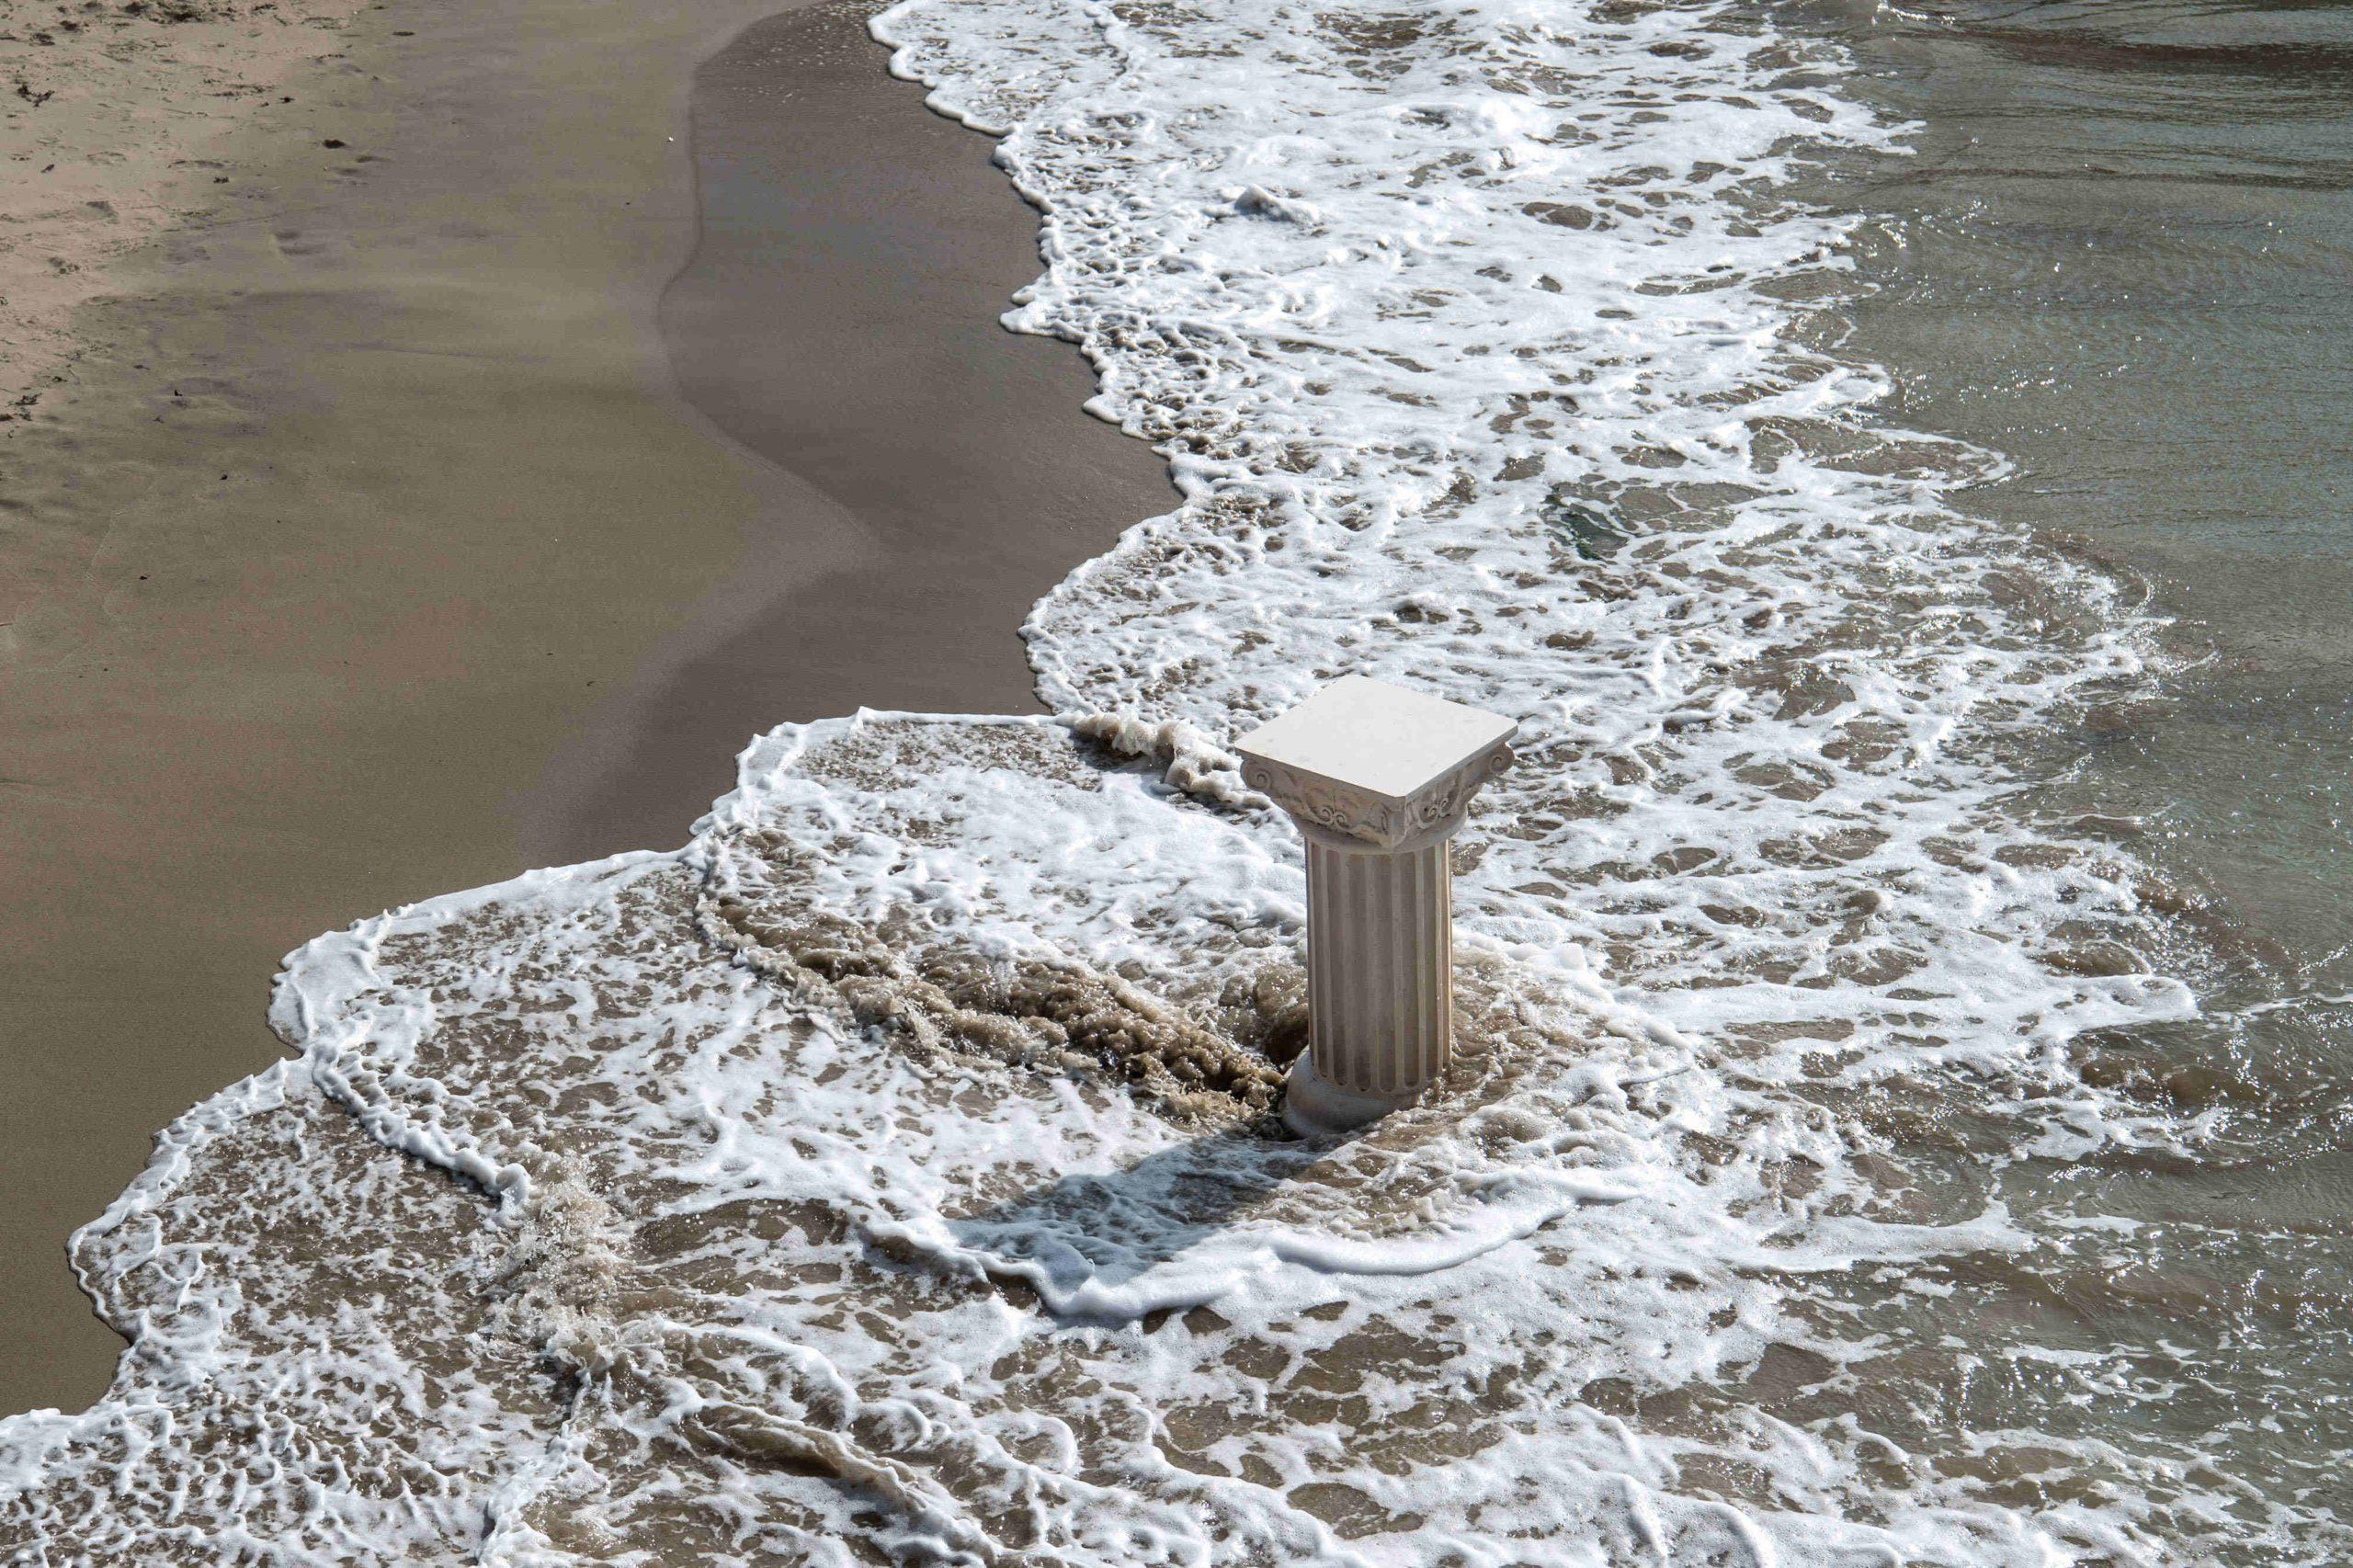 Plinth in the Sea